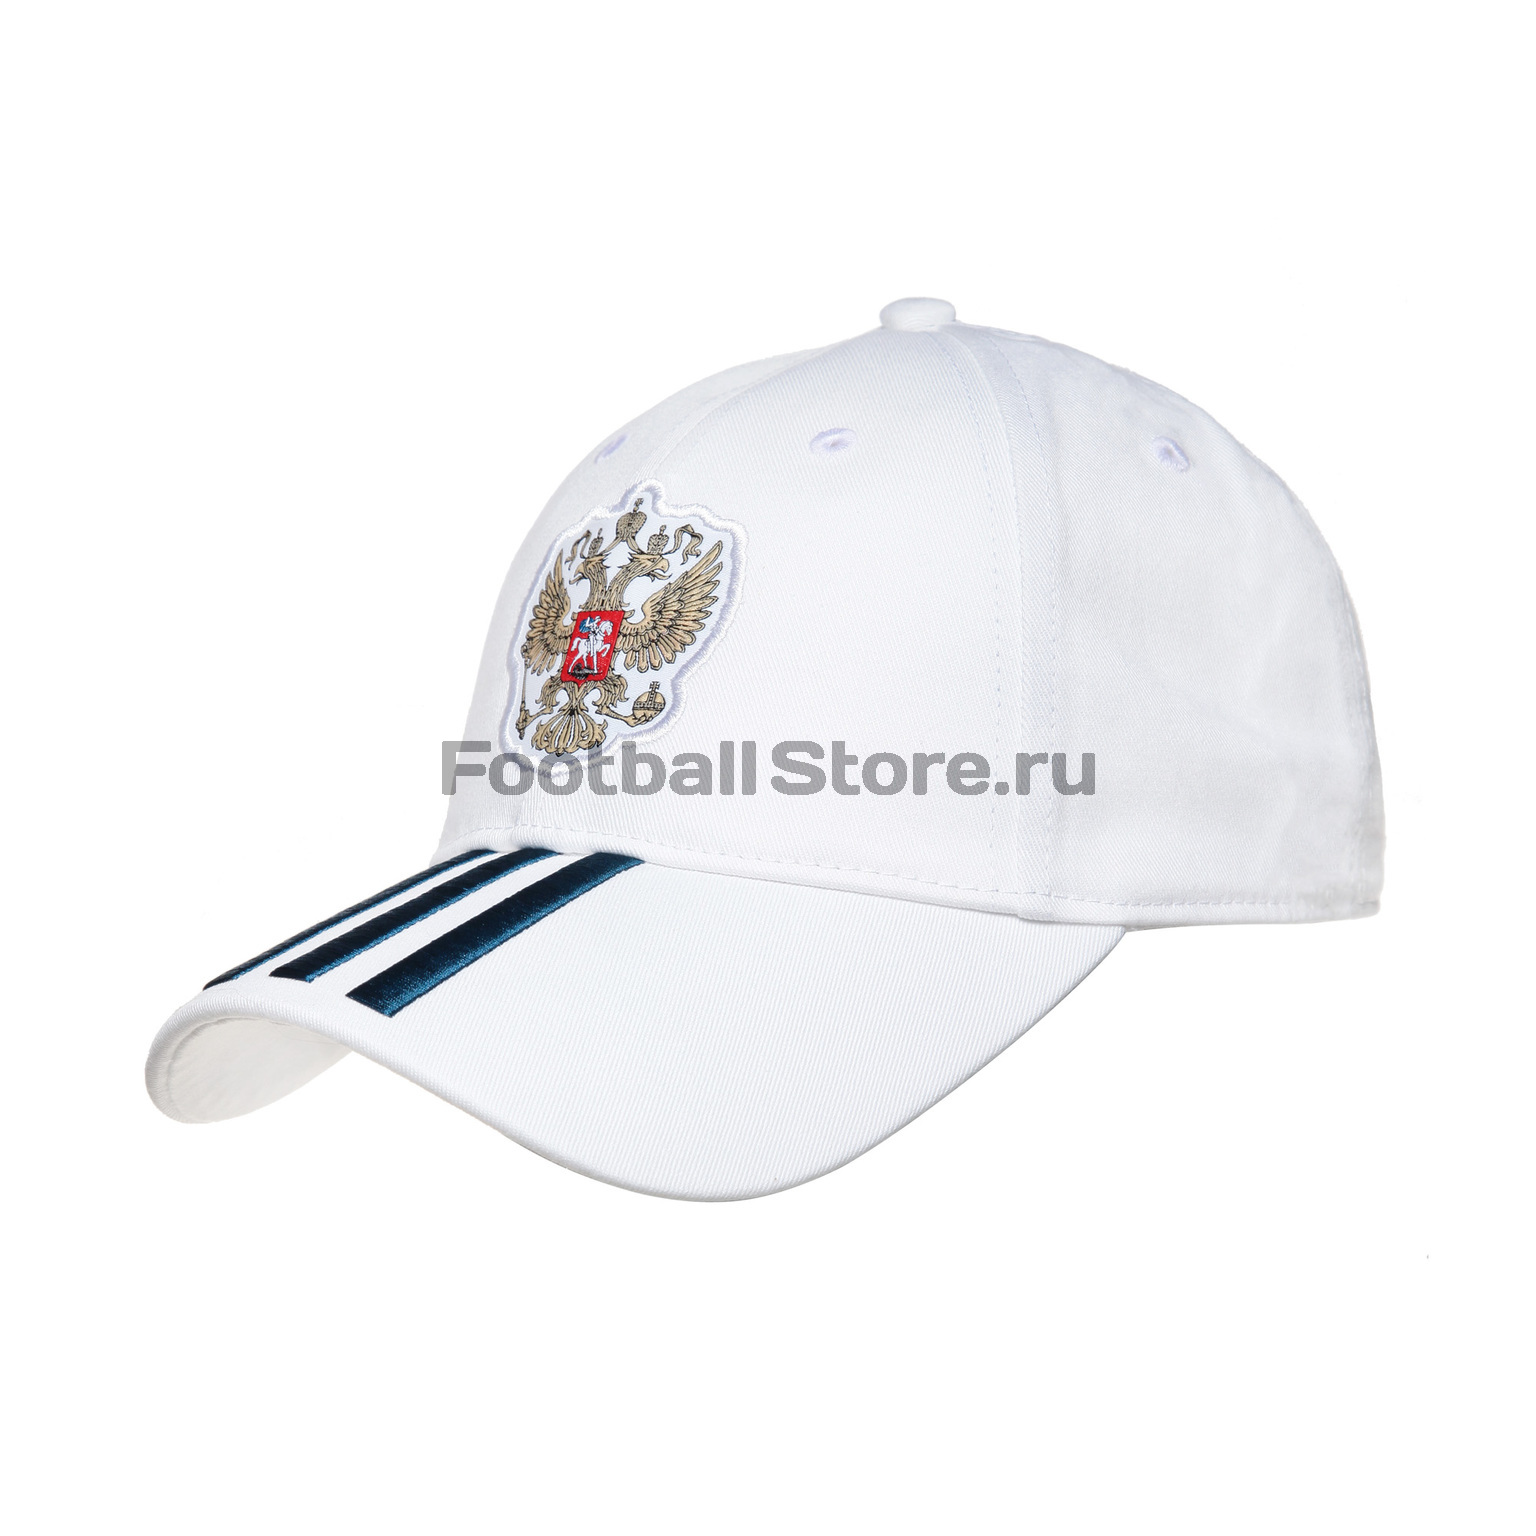 Бейсболка Adidas Russia 3S Cap CF4974 adidas adidas russia 3 stripes cap